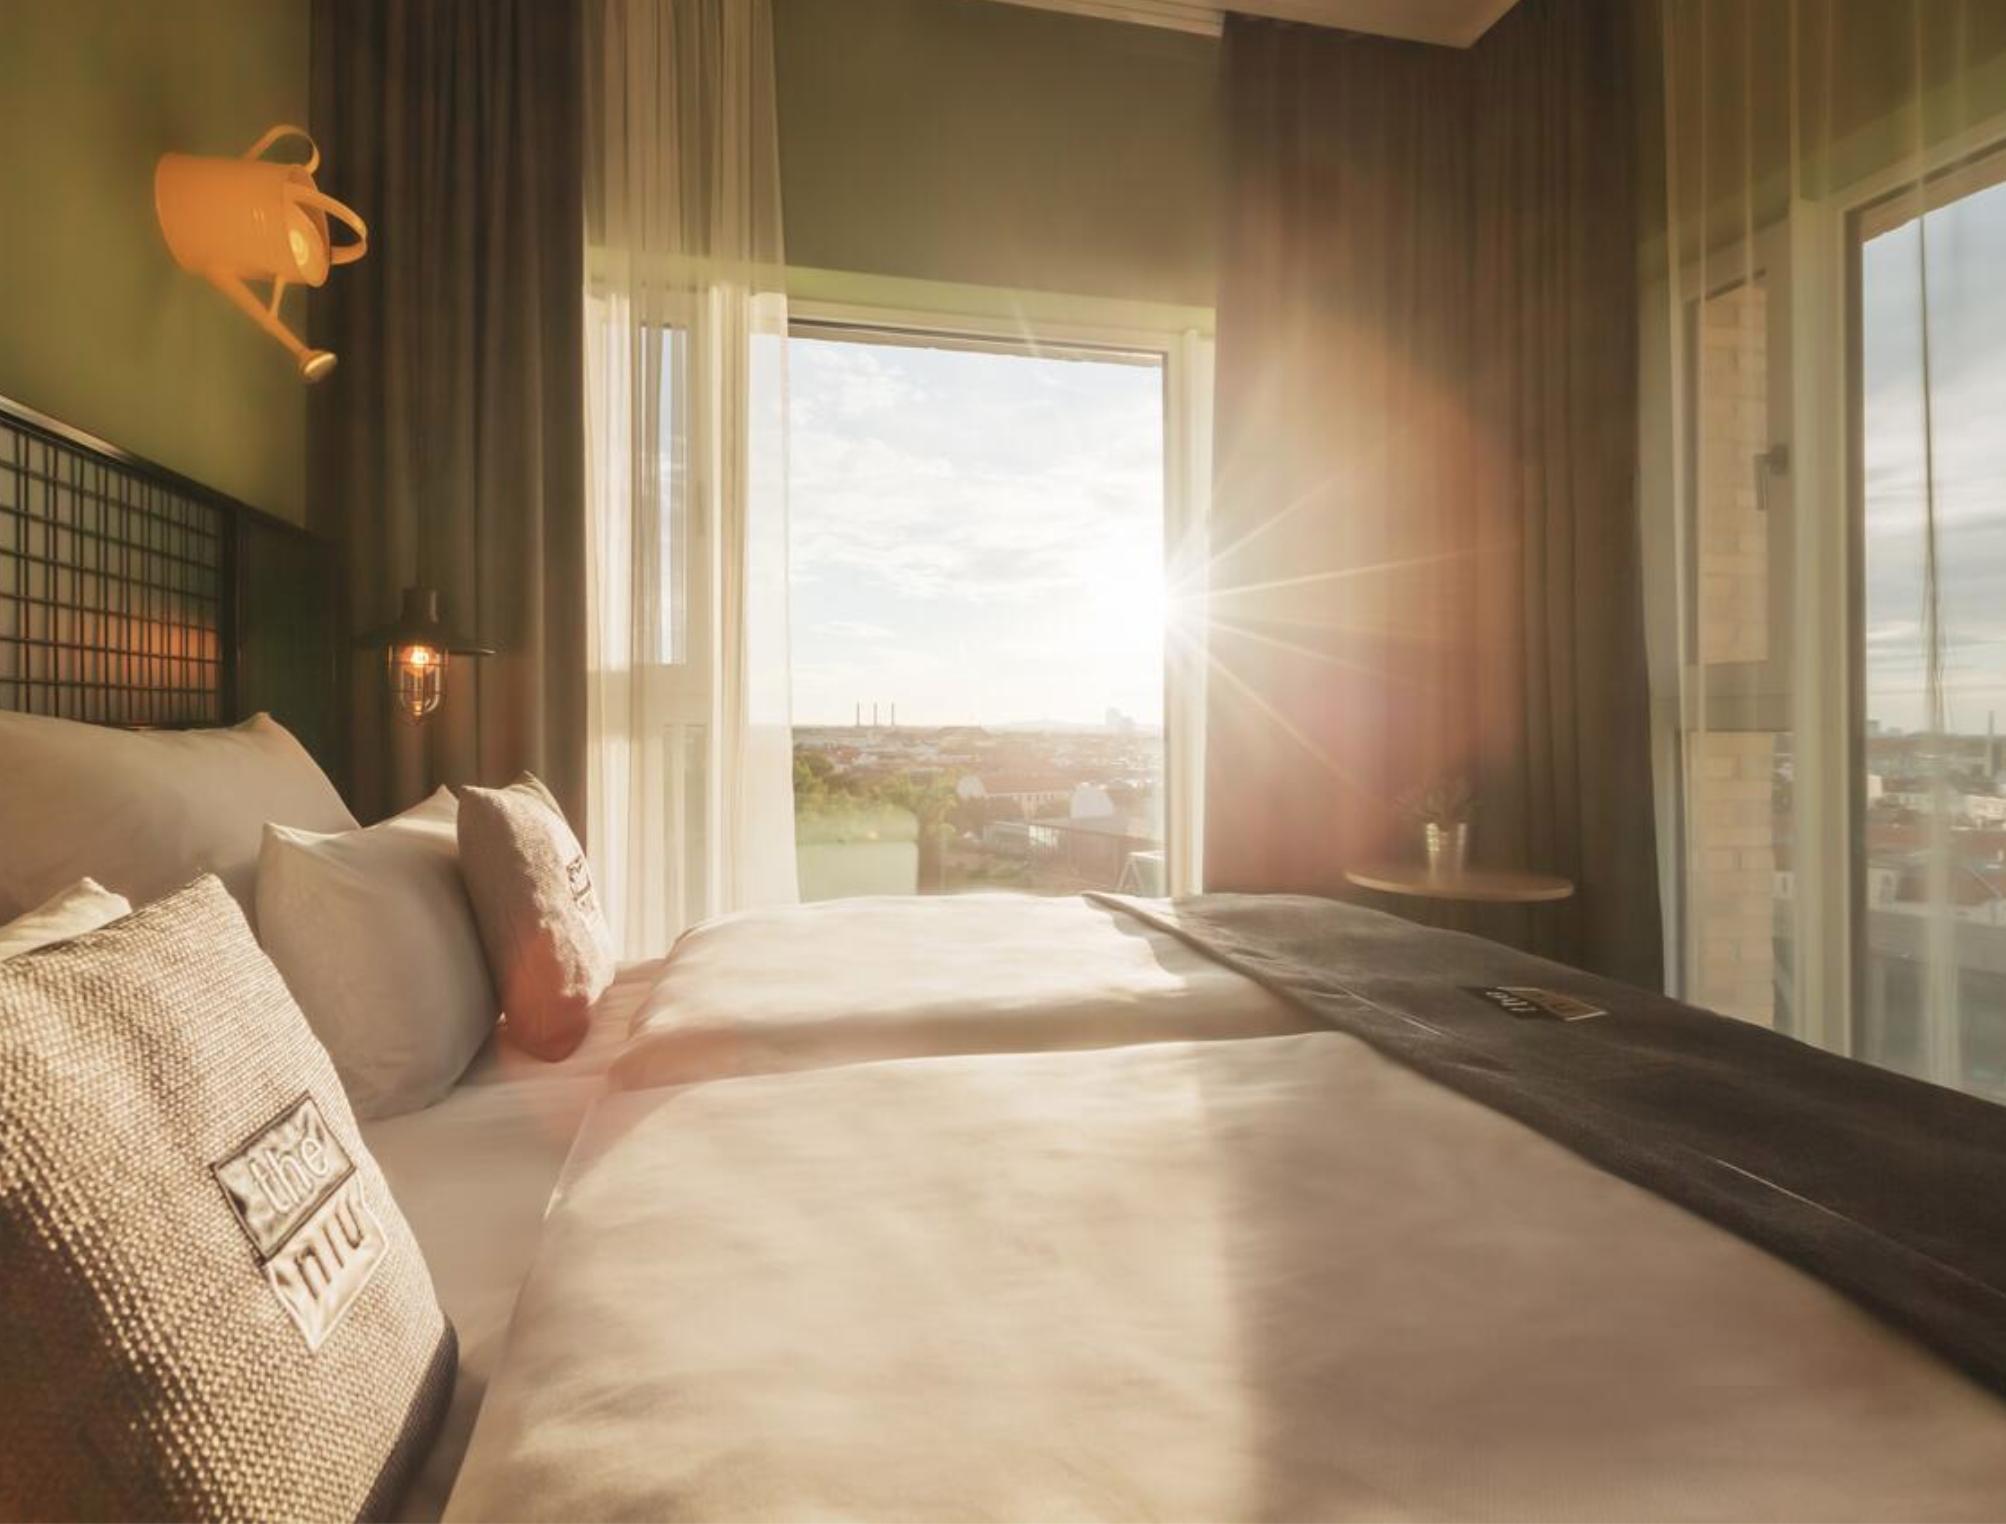 Berlin: neues the niu Dwarf Hotel - Doppelzimmer inkl. Frühstücksbox / gratis Storno / August 50€ / September - Januar 54€